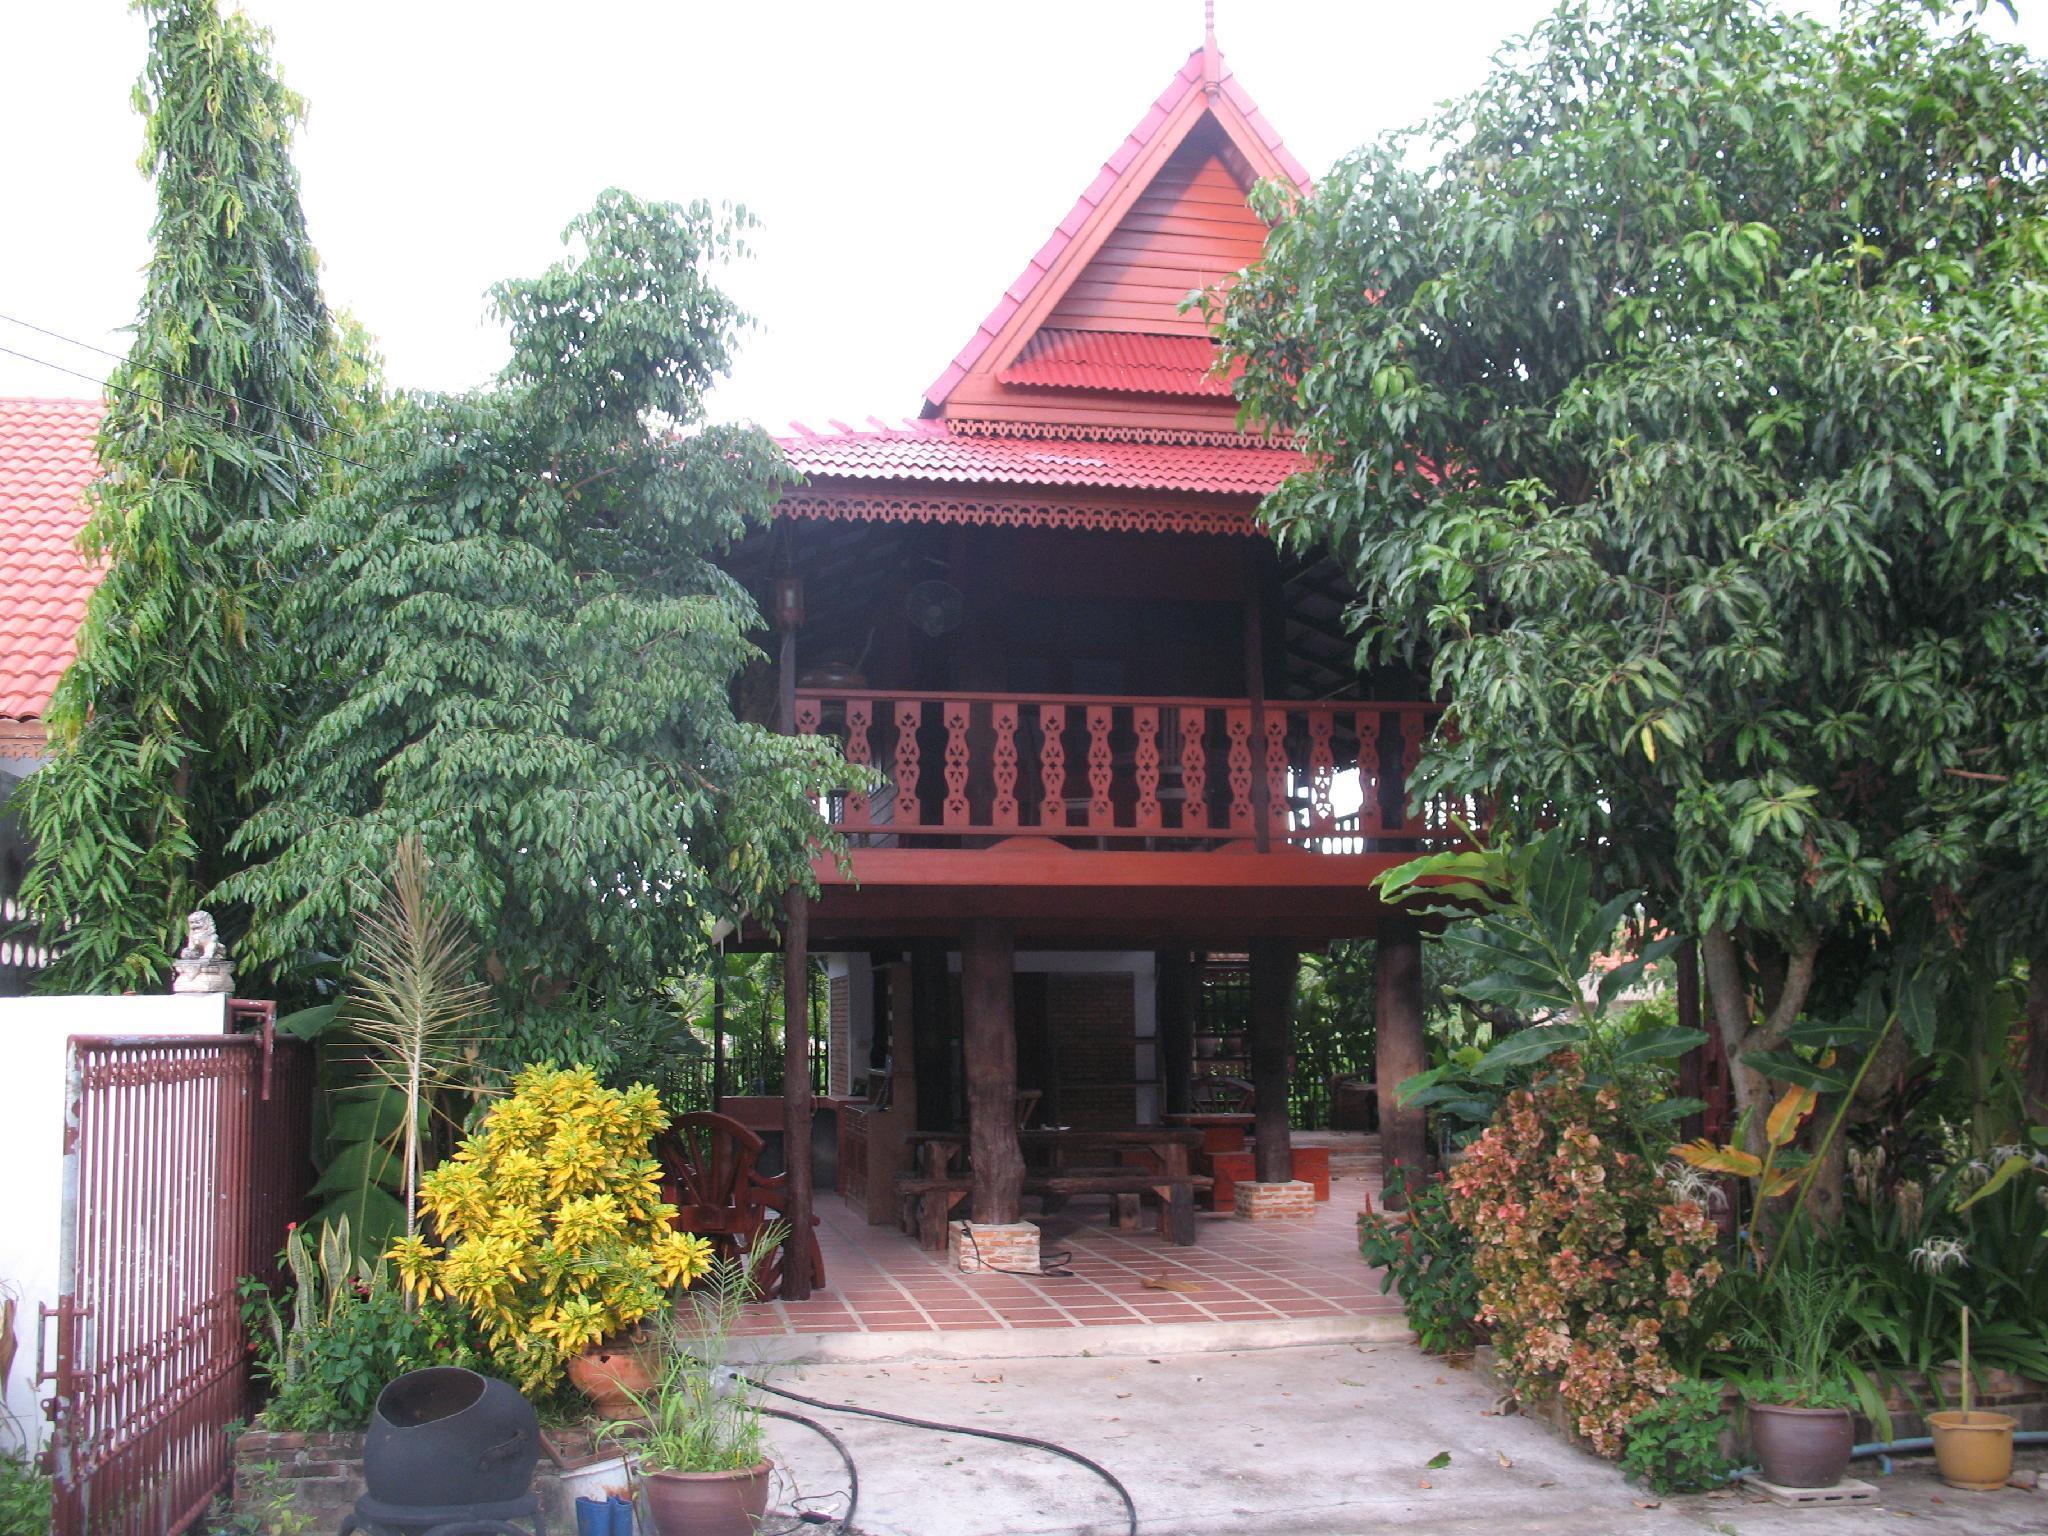 teak house chiang mai บ้านเดี่ยว 2 ห้องนอน 2 ห้องน้ำส่วนตัว ขนาด 900 ตร.ม. – หางดง